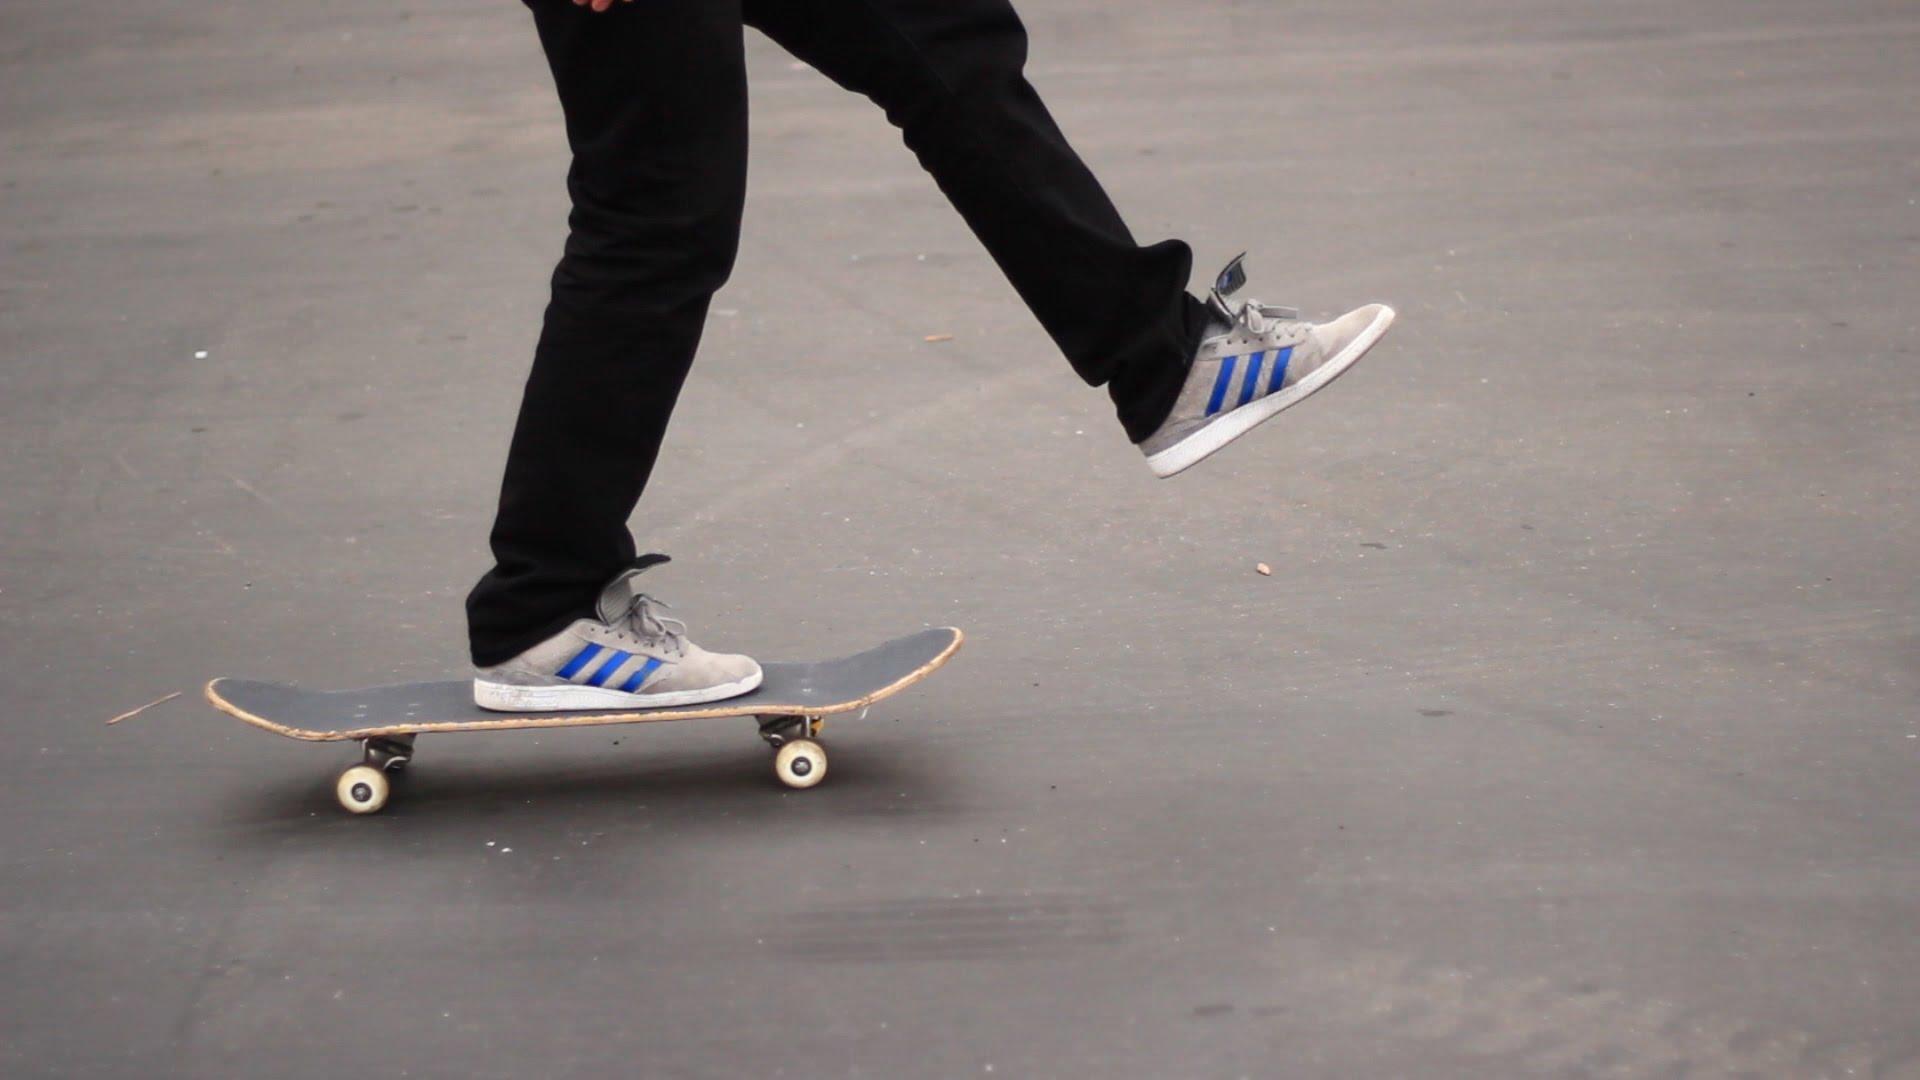 Penny Skateboards Girl Wallpaper Tablas De Skate Que Debes Conocer Px Sports 24 7 Action